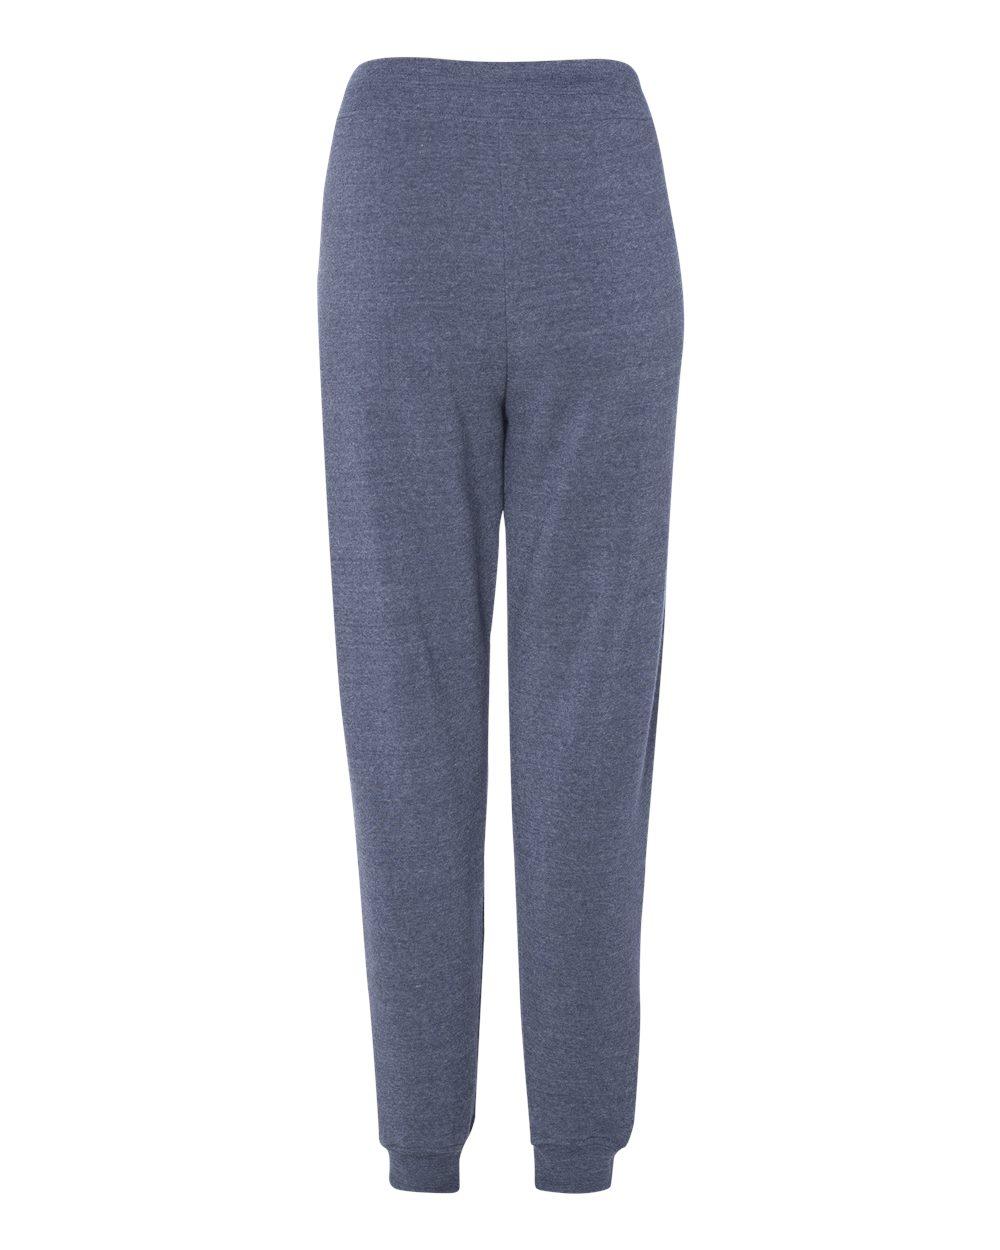 Alternative-Mens-Eco-Fleece-Dodgeball-Pants-Sweatpants-Pocket-9881-up-to-2XL thumbnail 19